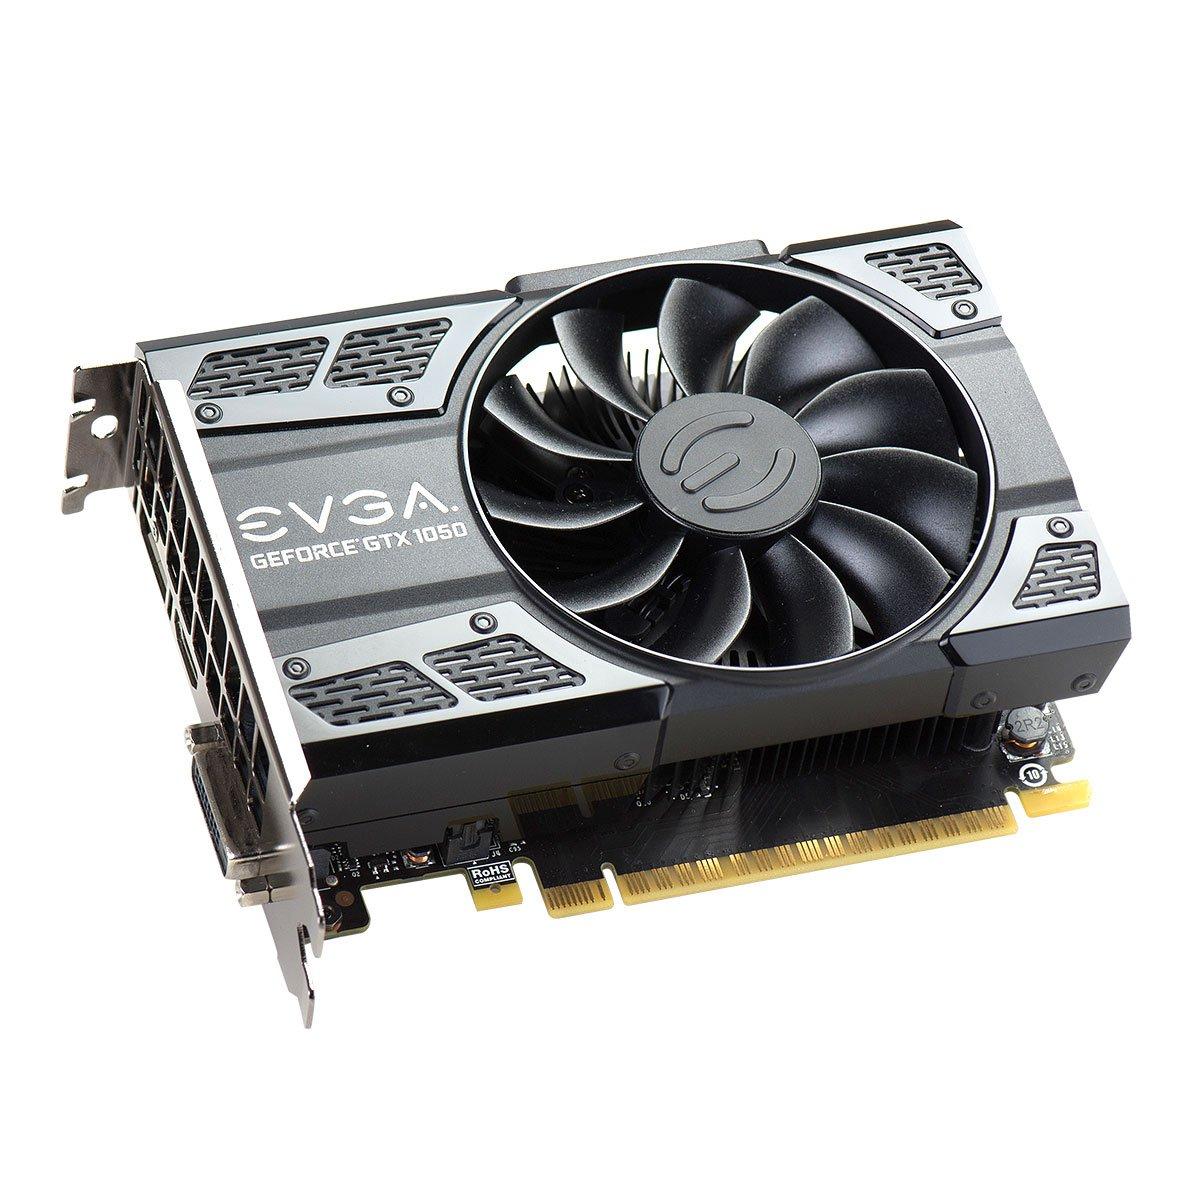 EVGA GeForce GTX 1050 Ti SC GAMING, 4GB GDDR5, DX12 OSD Support (PXOC) Graphics Card 04G-P4-6253-KR by EVGA (Image #4)